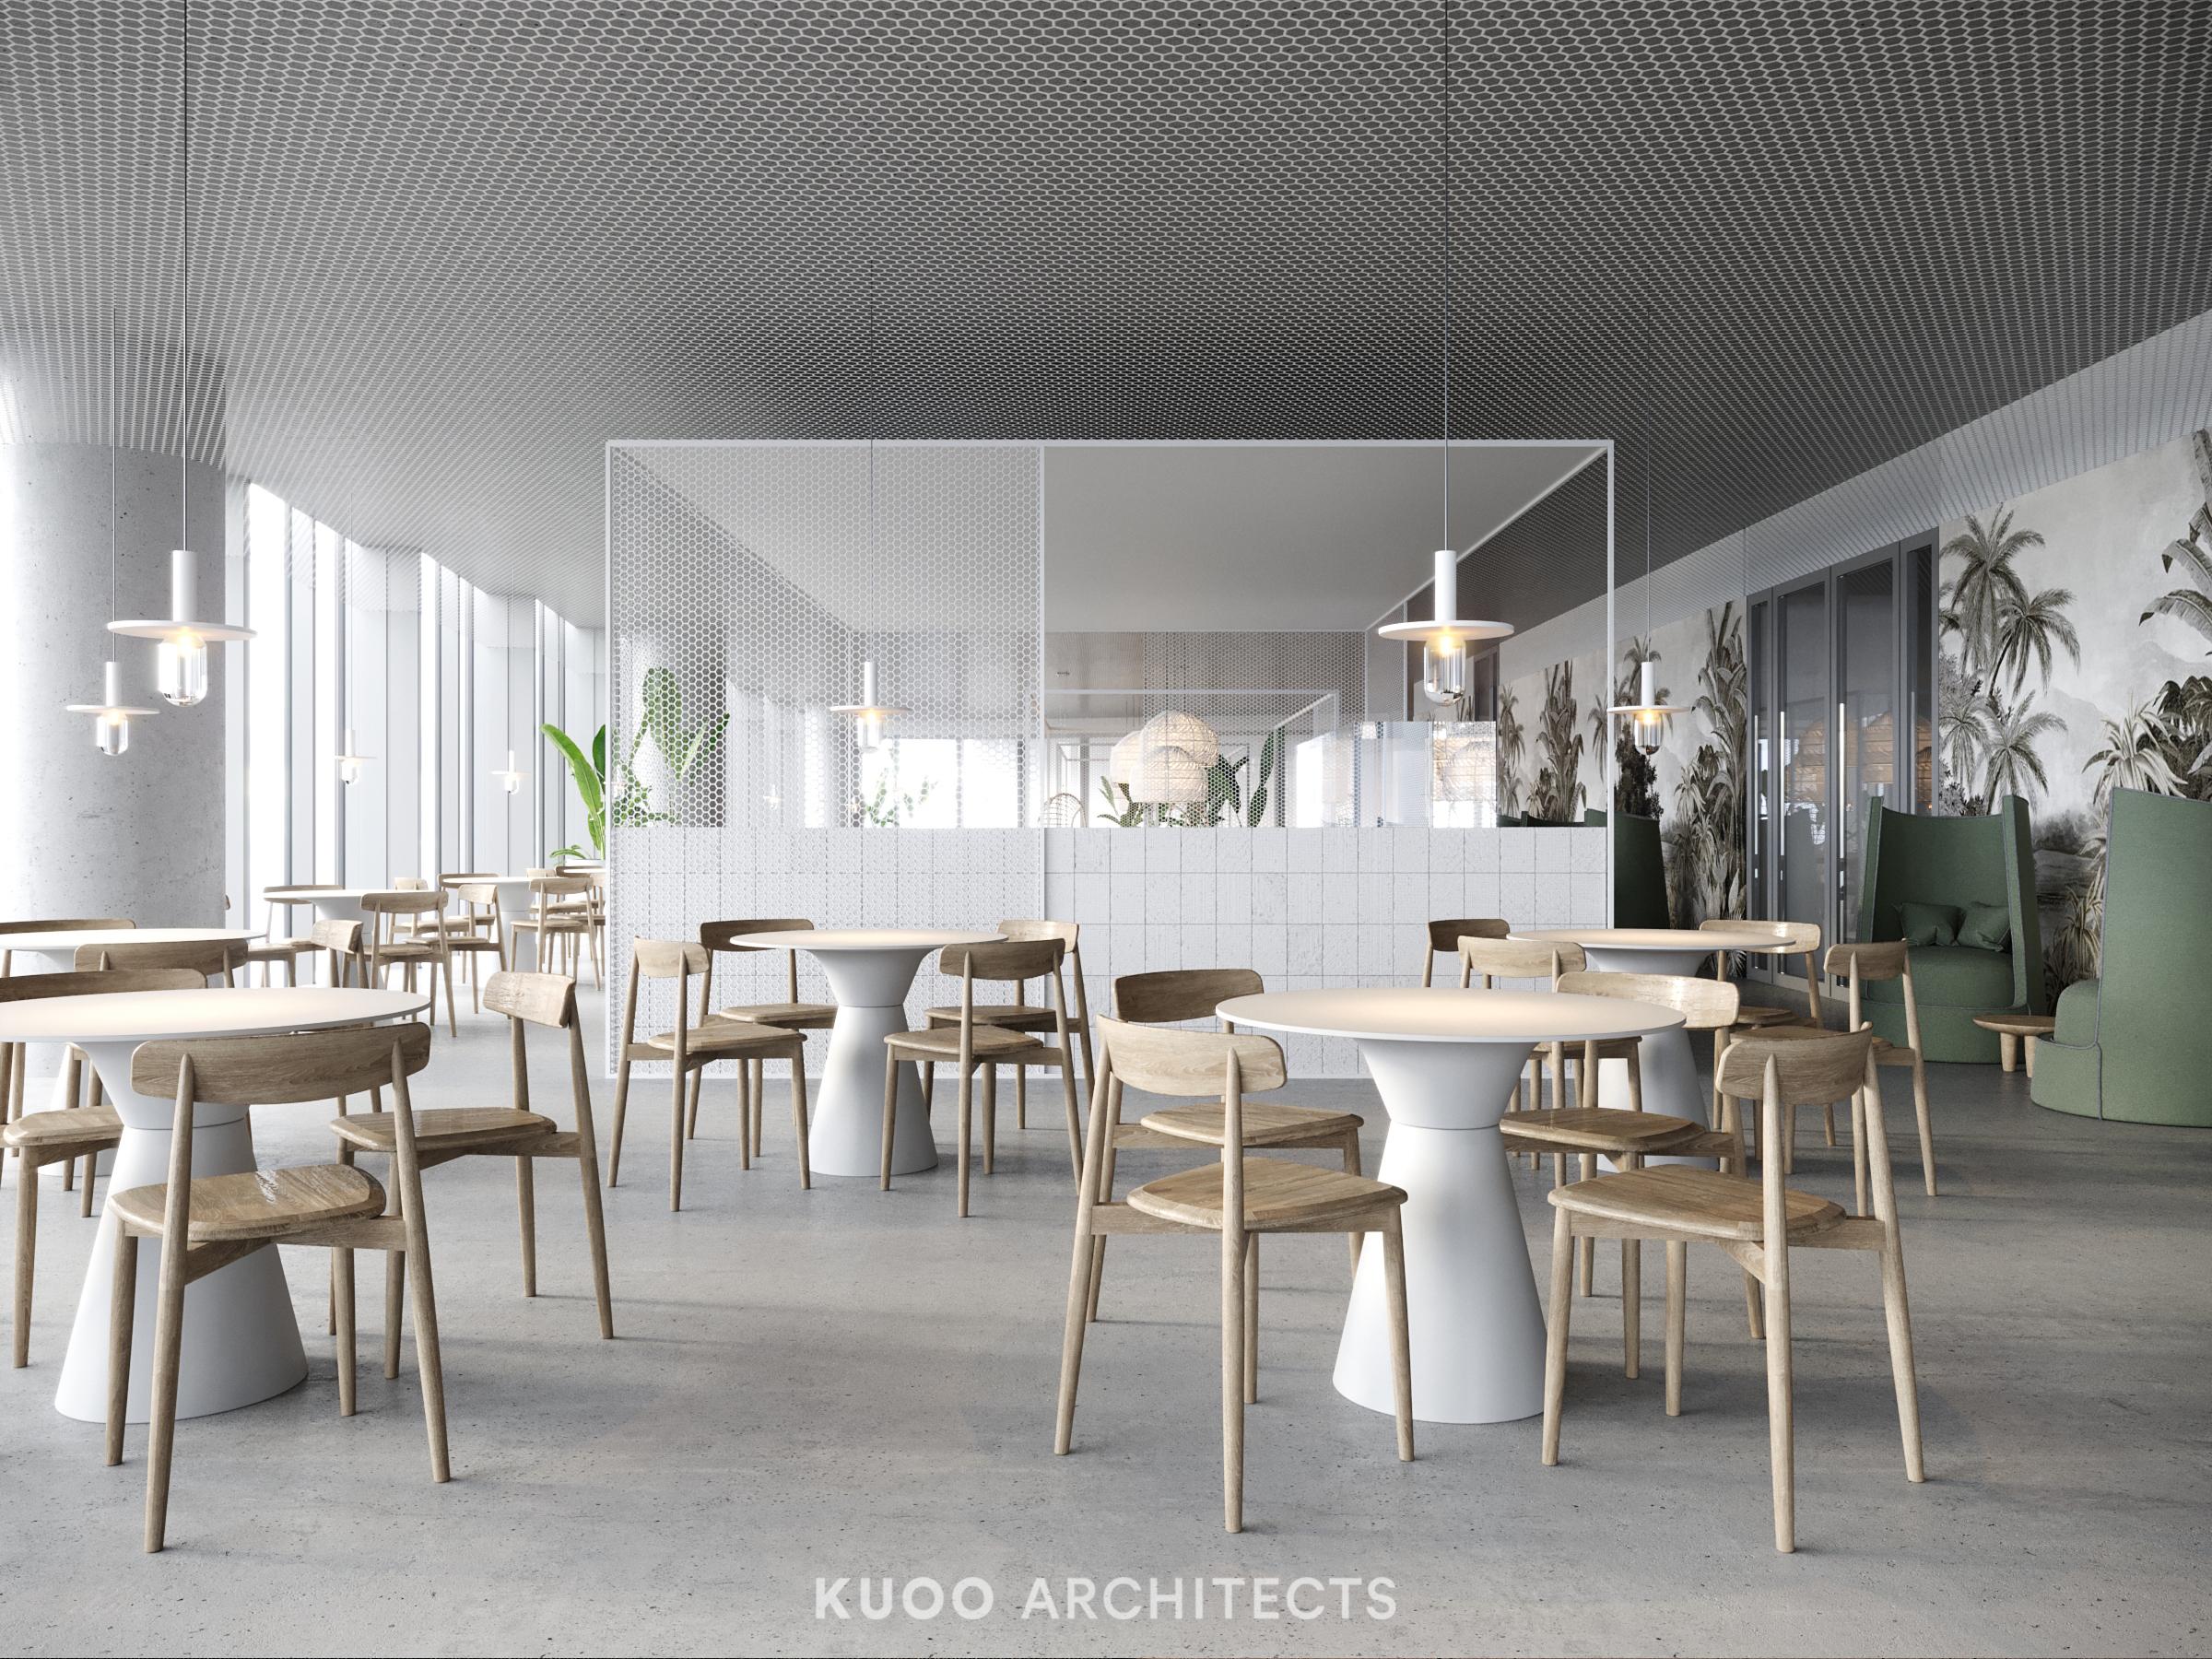 kuoo_architects_mcafe_3